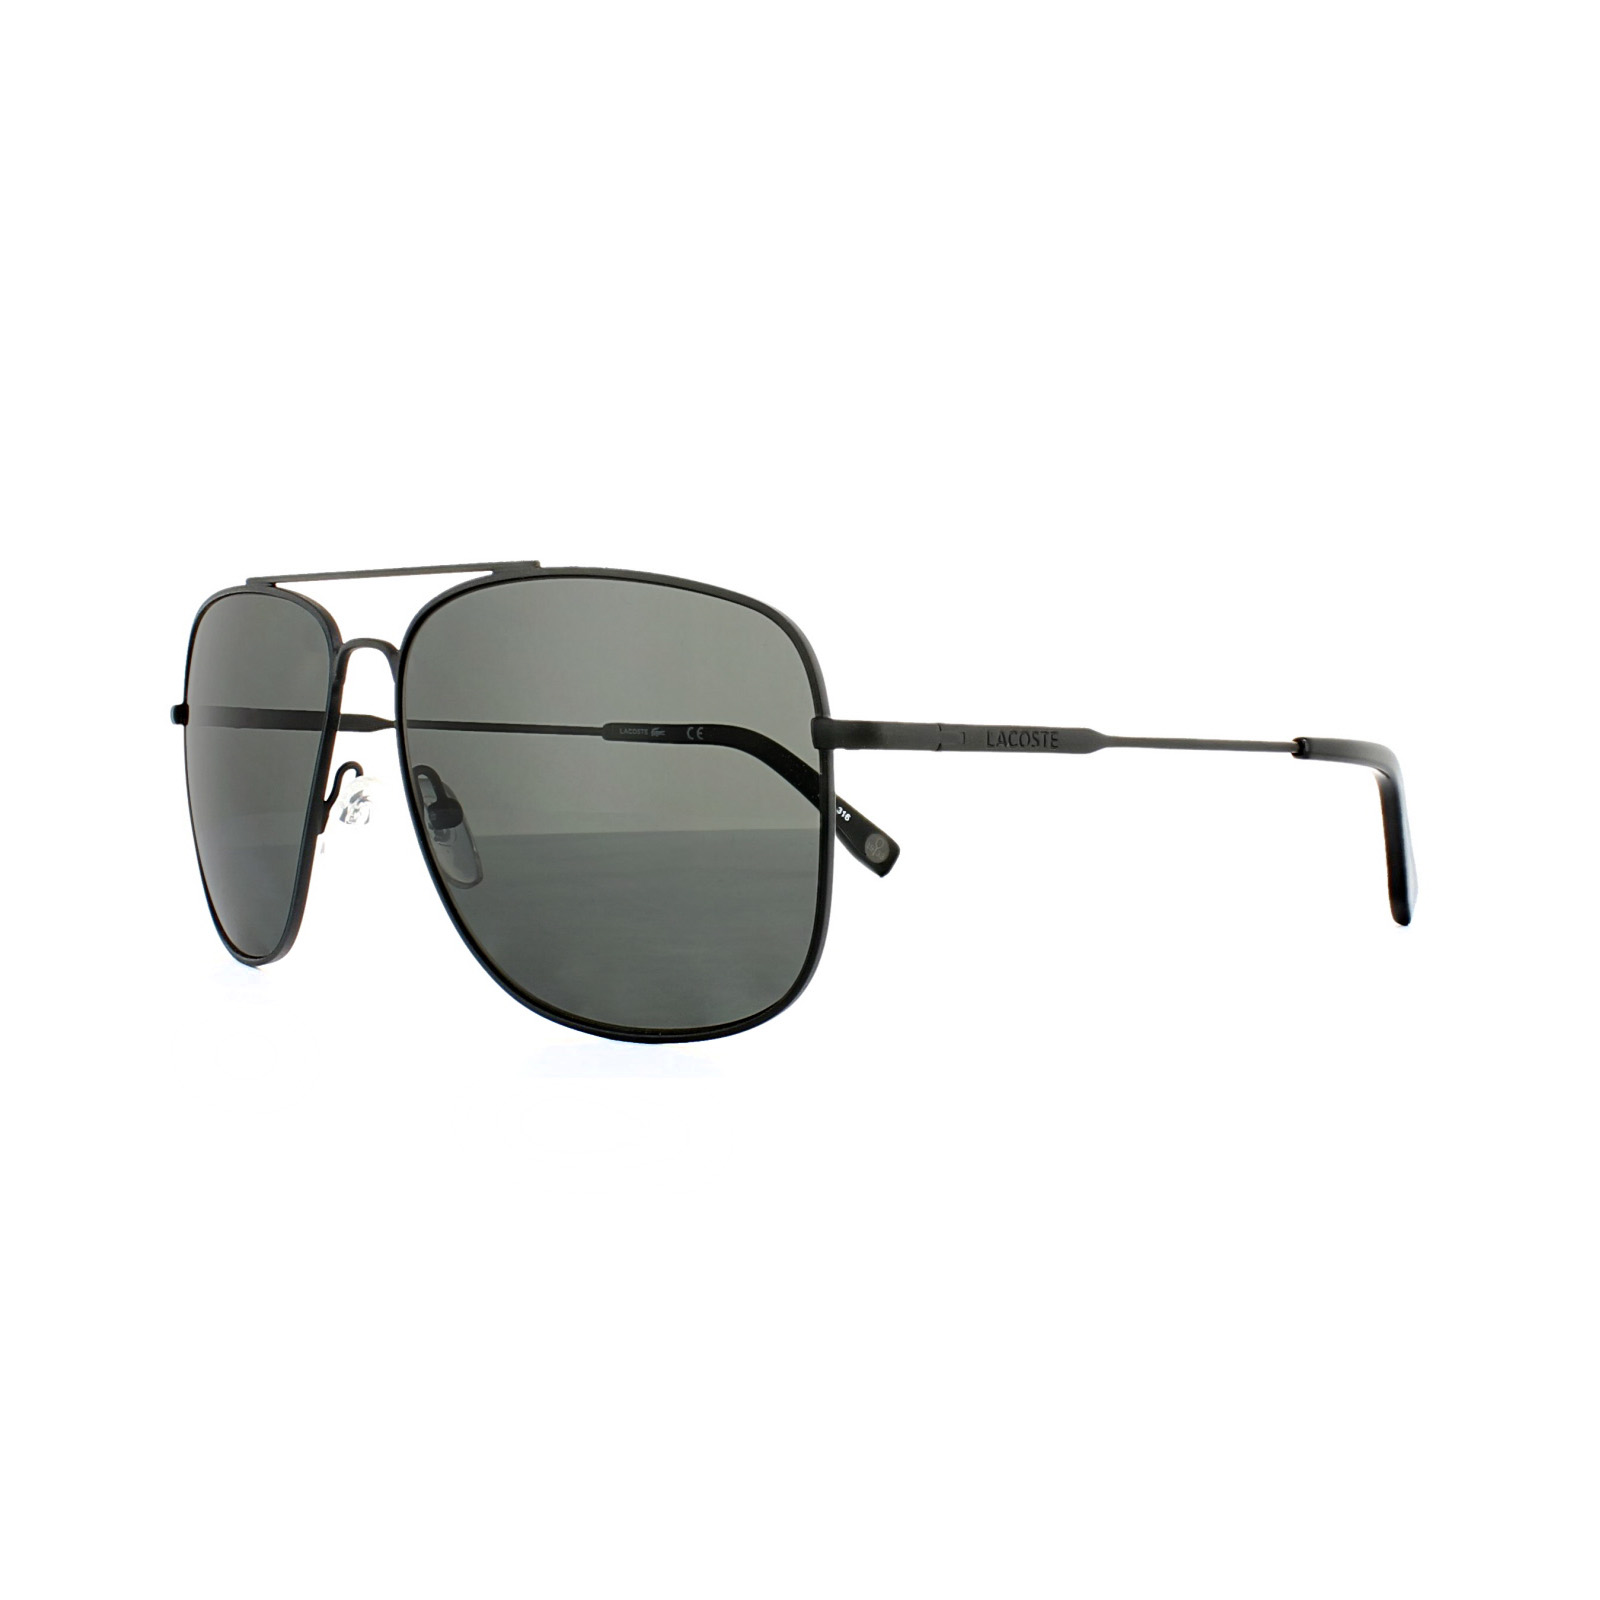 92c8006261a0 Lacoste Sunglasses L175SP 001 Matt Black Grey Polarized 886895236706 ...